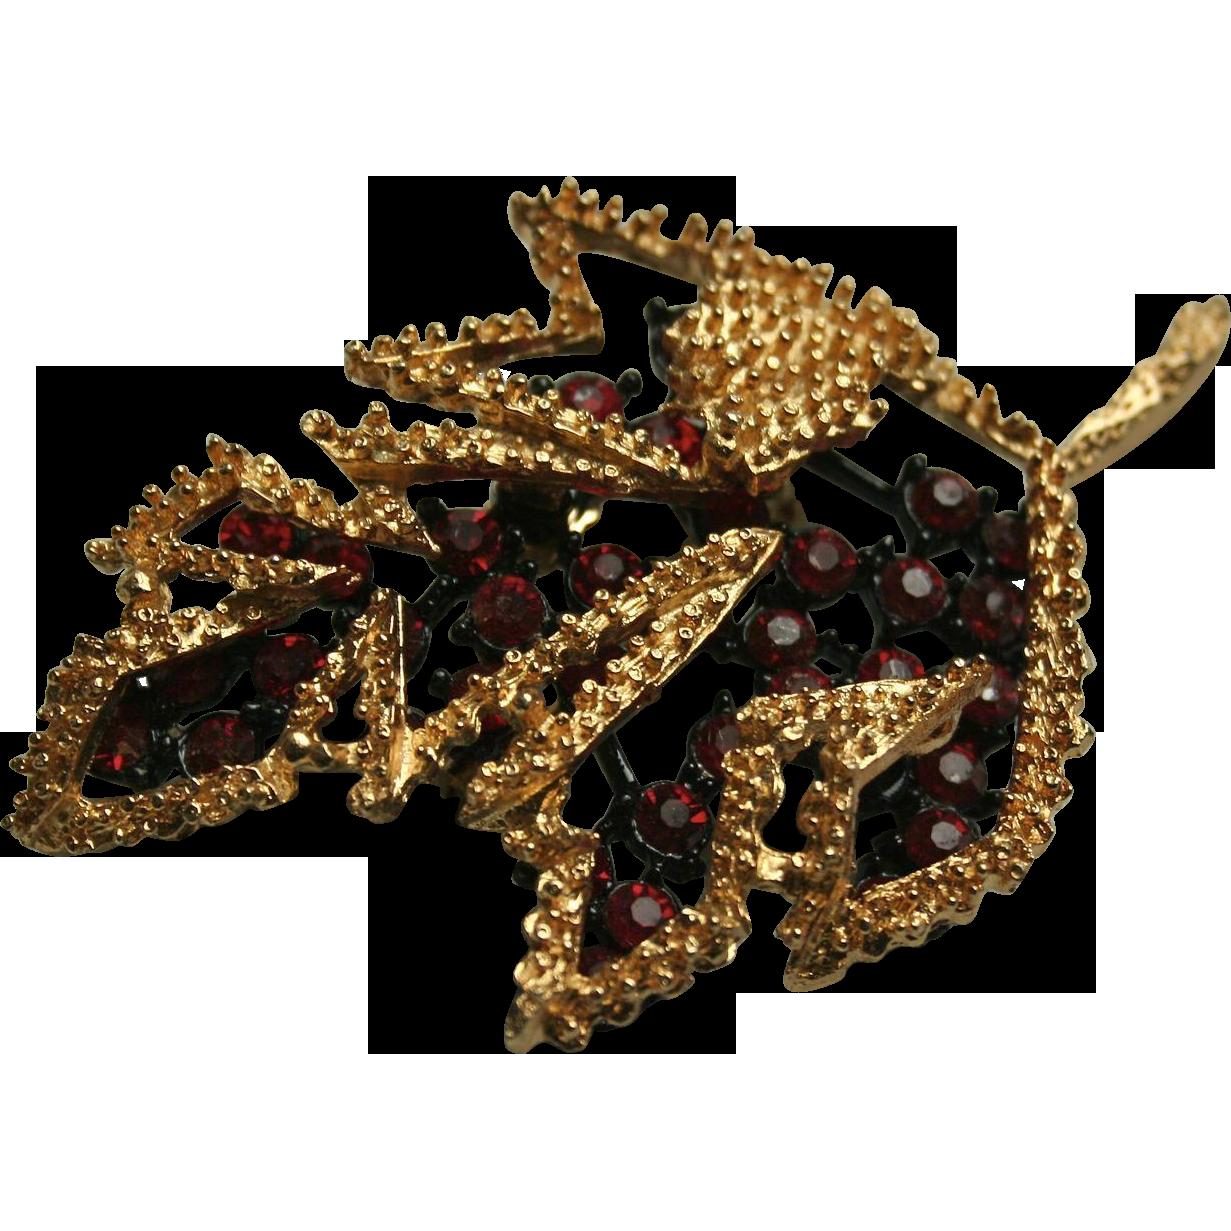 3 D Autumn Leaf Reticulated Red Rhinestone Brooch From Randomharvest On Ruby Lane